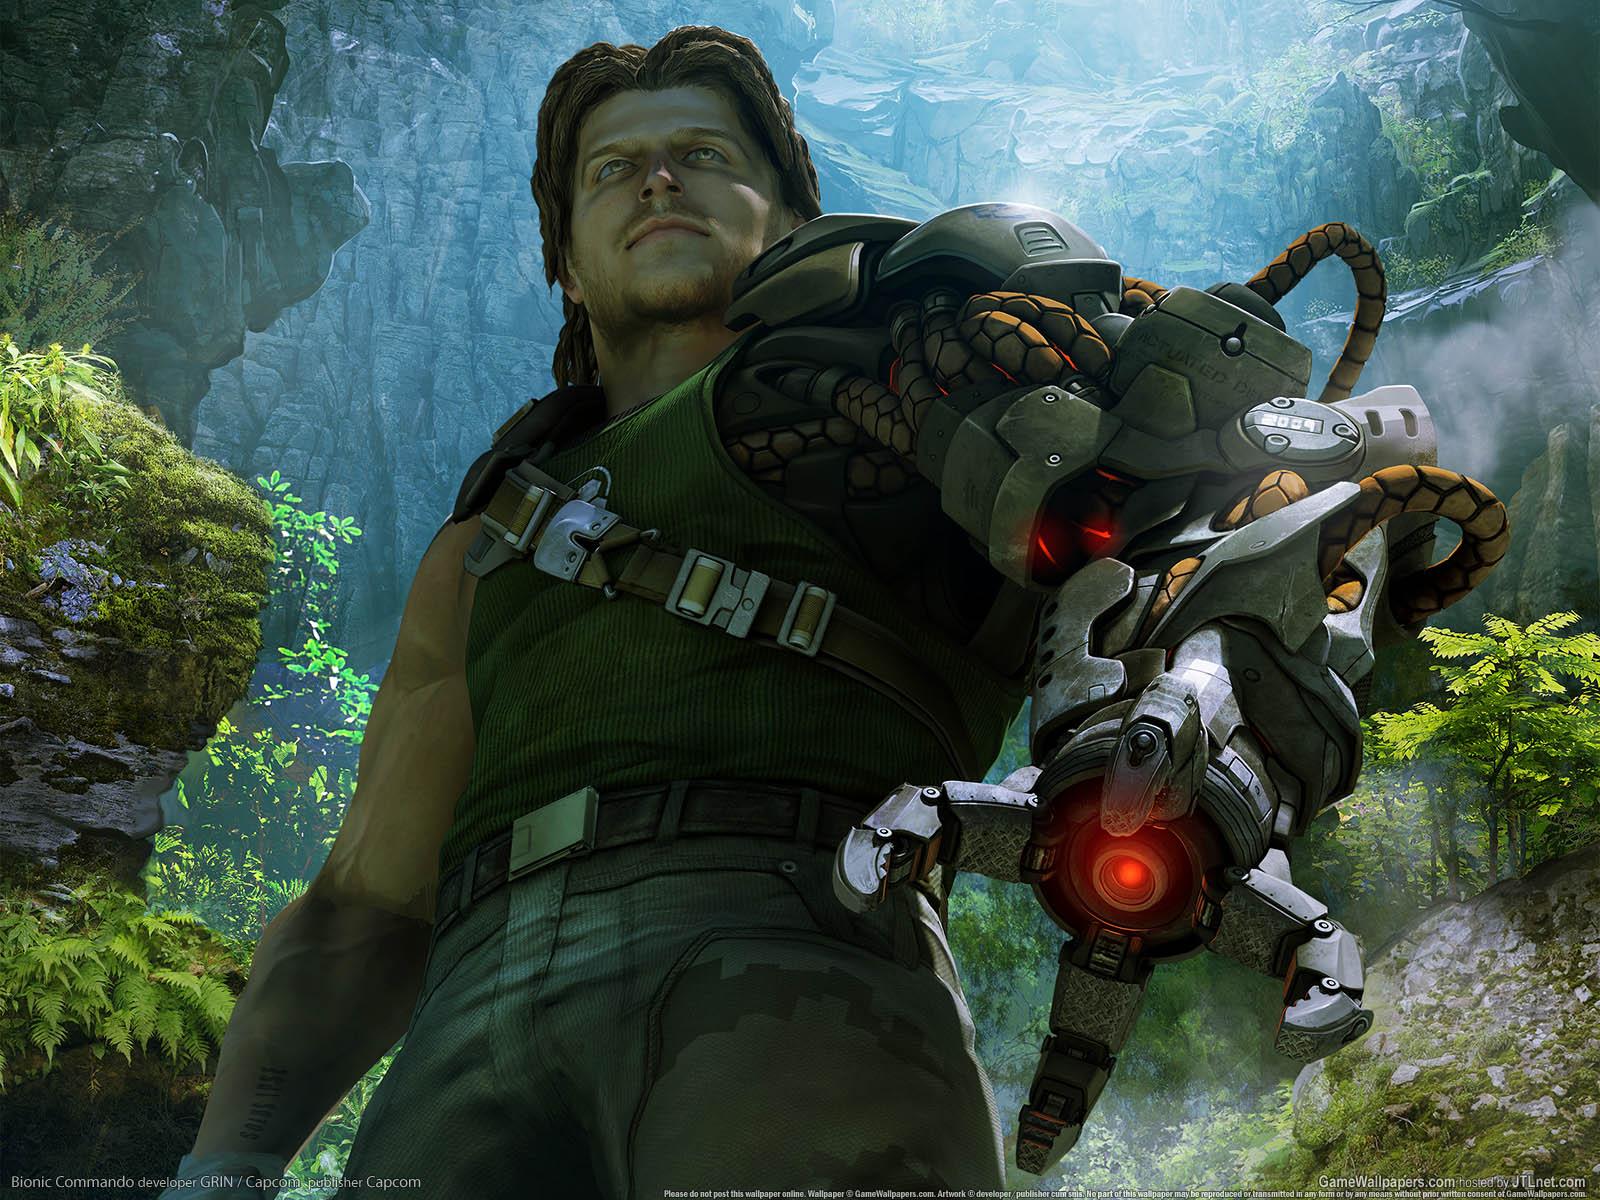 Bionic Commandoνmmer=03 achtergrond  1600x1200